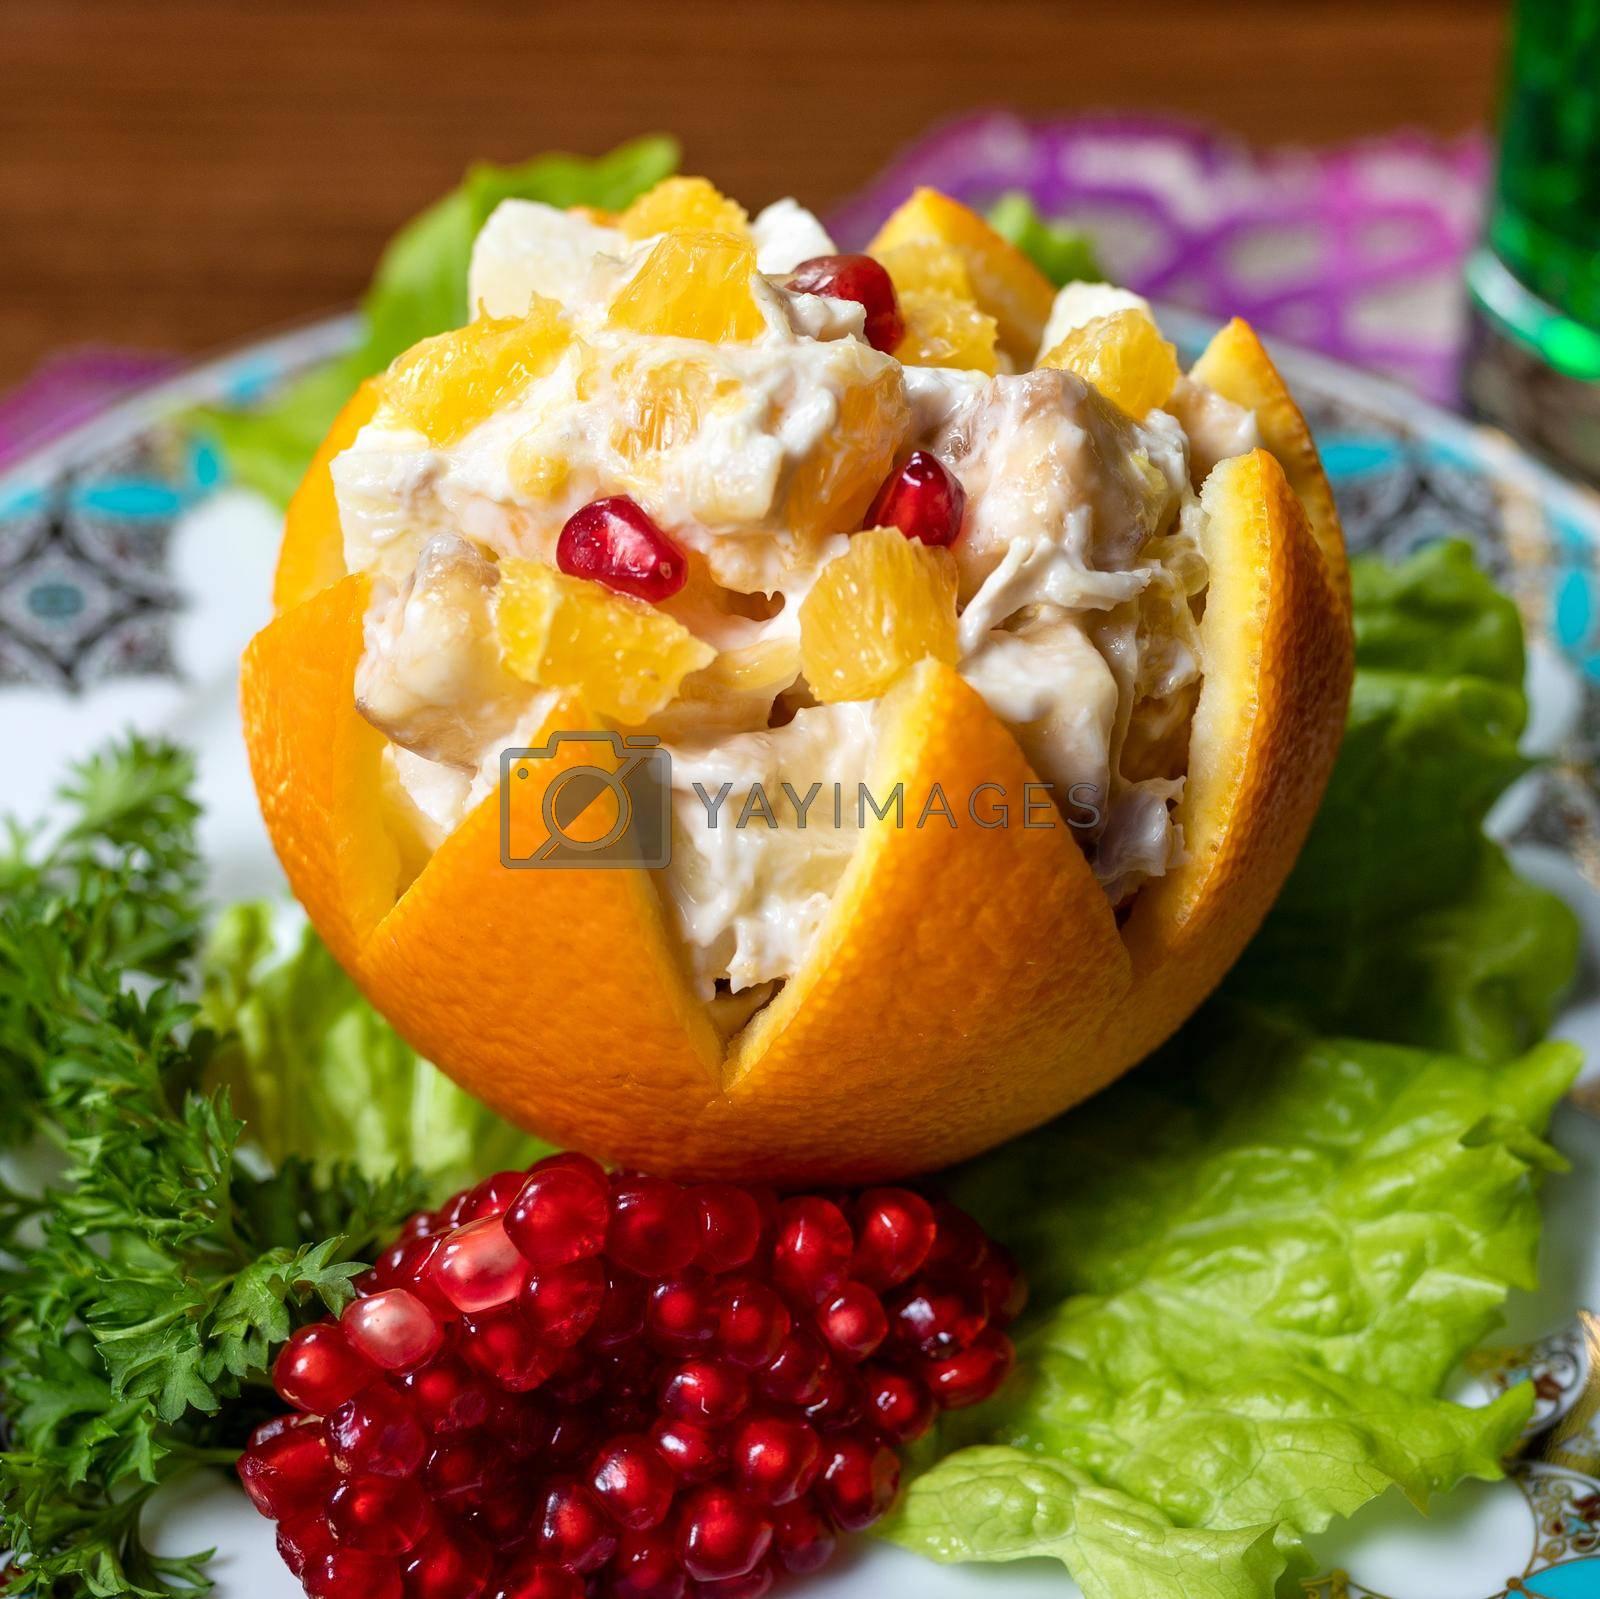 Orange snack with pomegranate close up